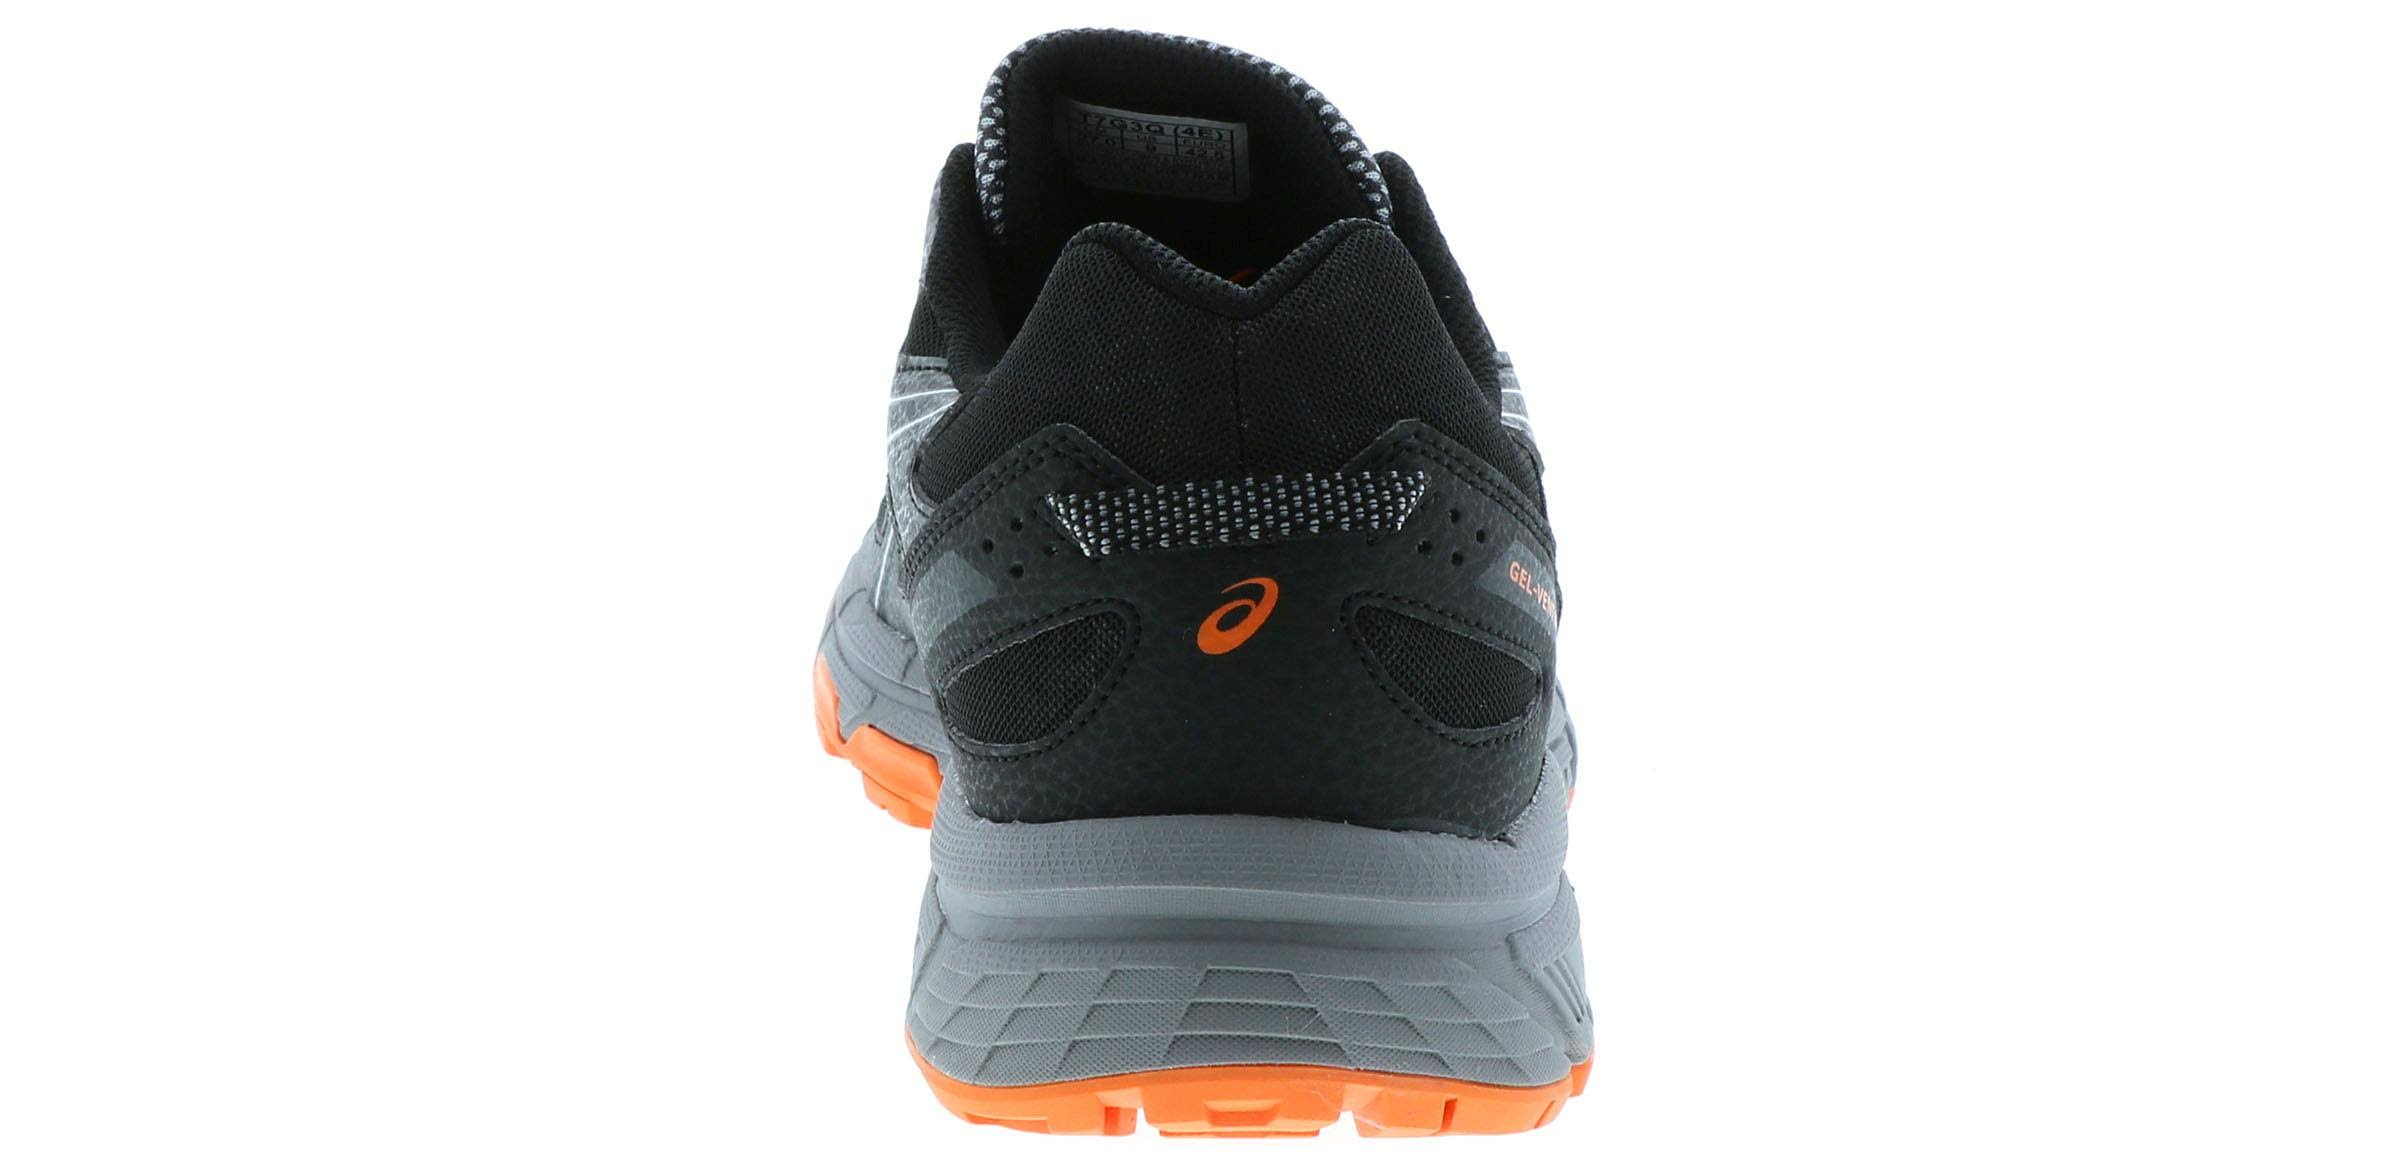 Naranja Para Gel De Gris 9 Running Hombre Zapatillas Asics 6 venture Negro CSwUxq